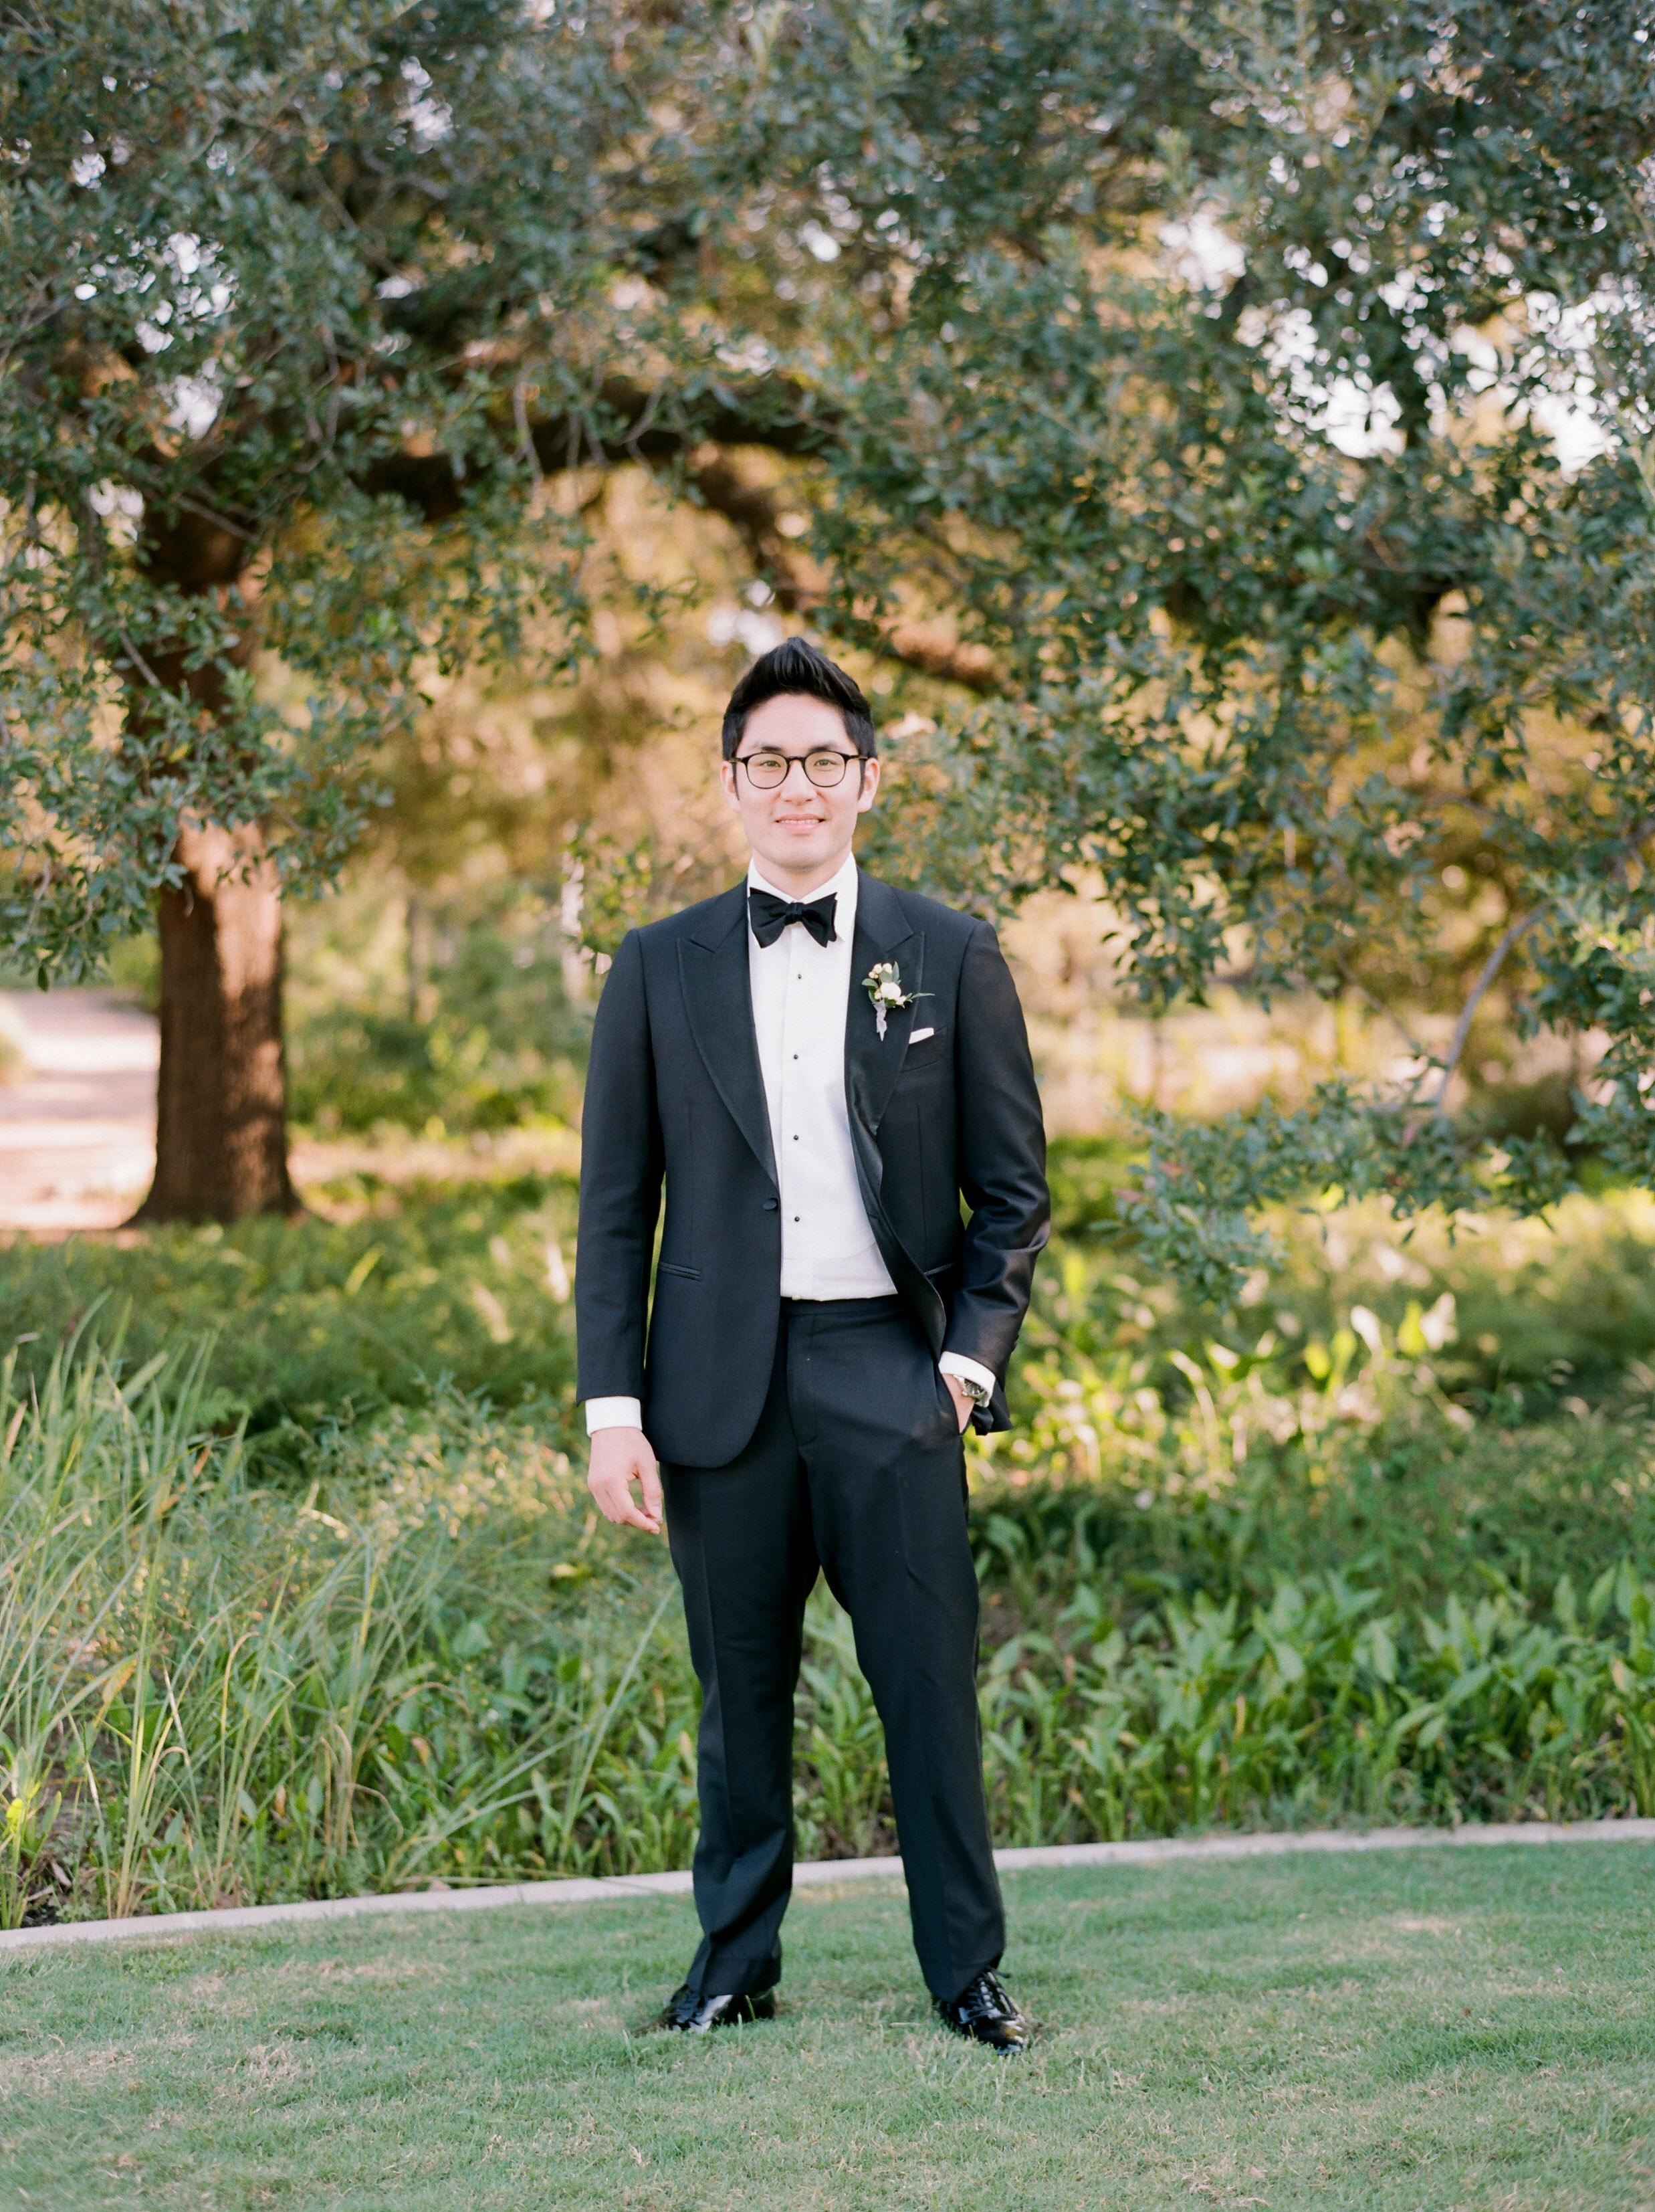 Martha-Stewart-Wedding-Dana-Fernandez-Photography-Josh-Texas-Film-Houston-Wedding-Fine-Art-Photographer-McGovern-Centennial-Gardens-Top-Best-170.jpg